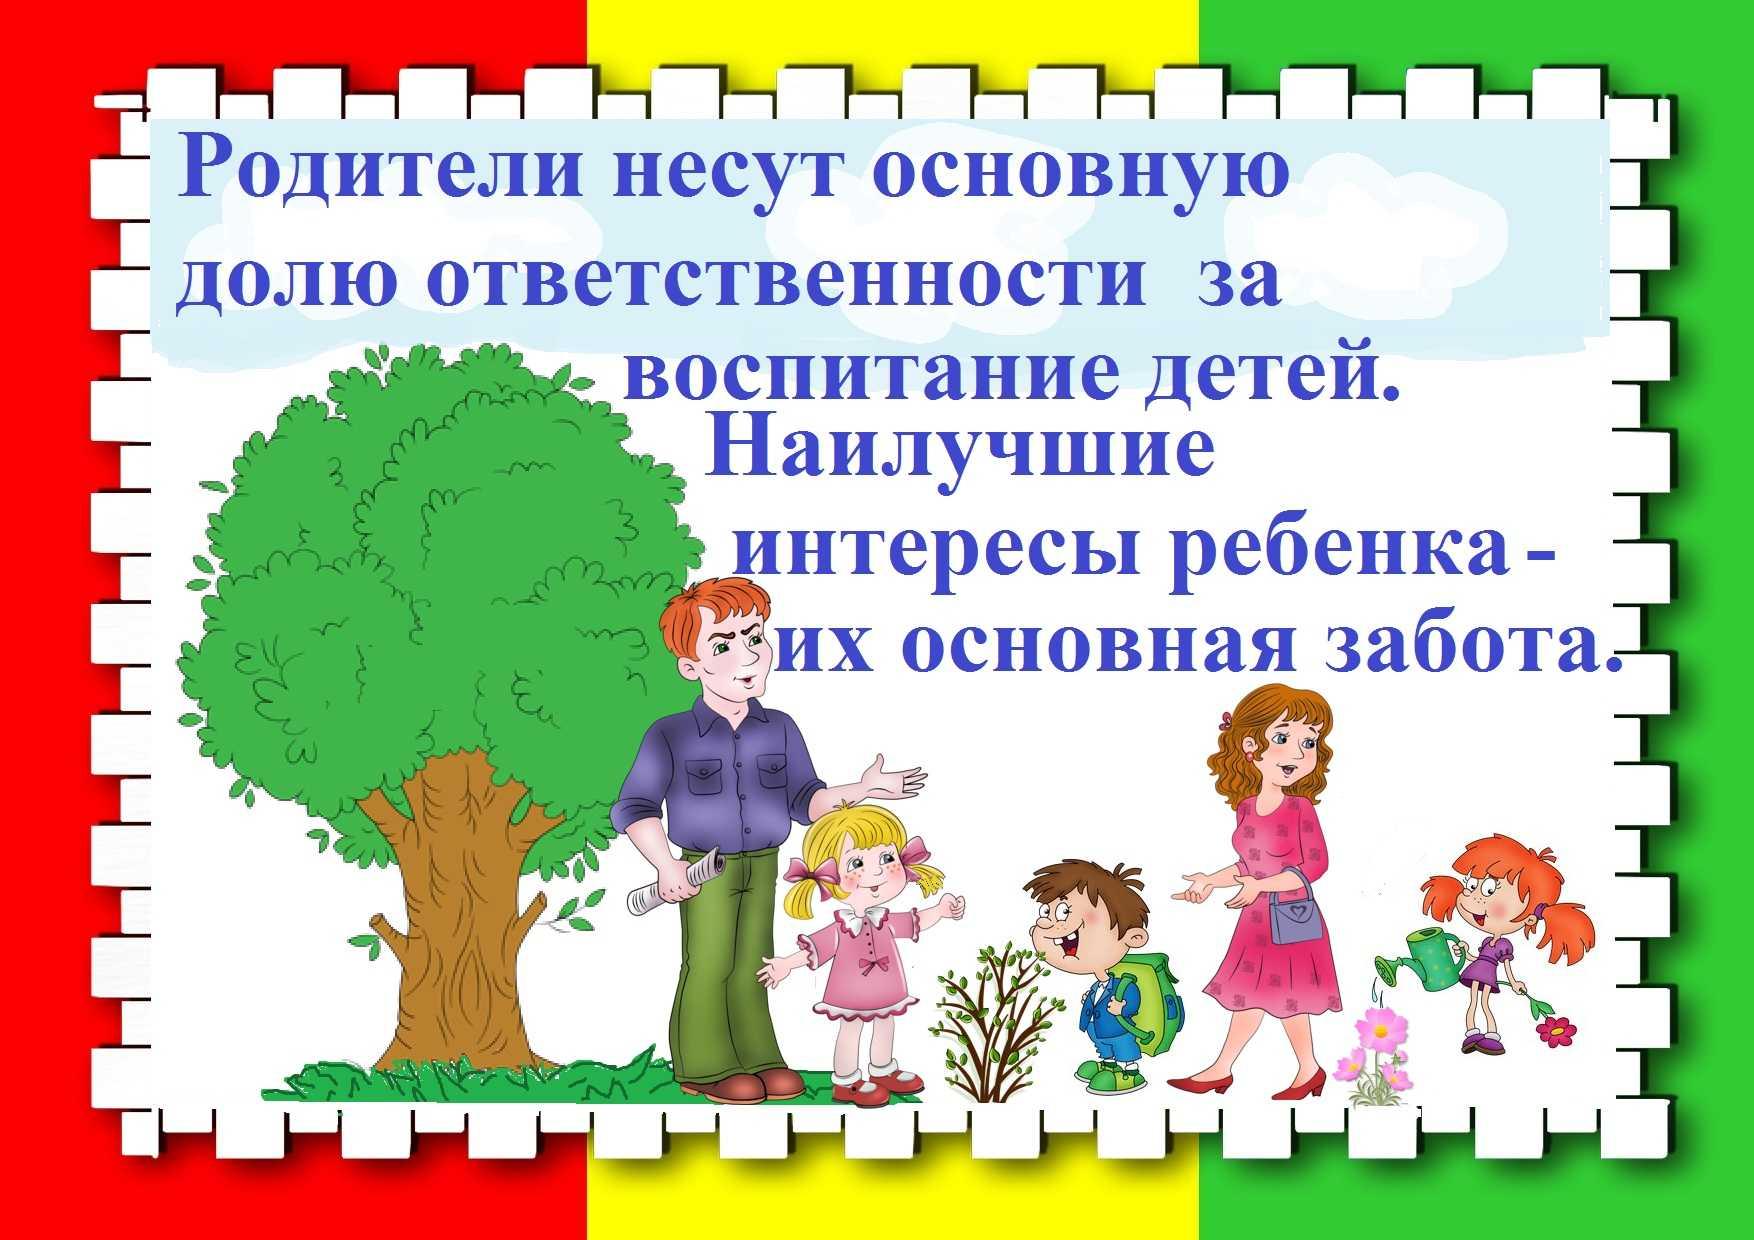 C:\Users\Татьяна\Desktop\ПРАВА ДЕТЕЙ\pravo_9.jpg